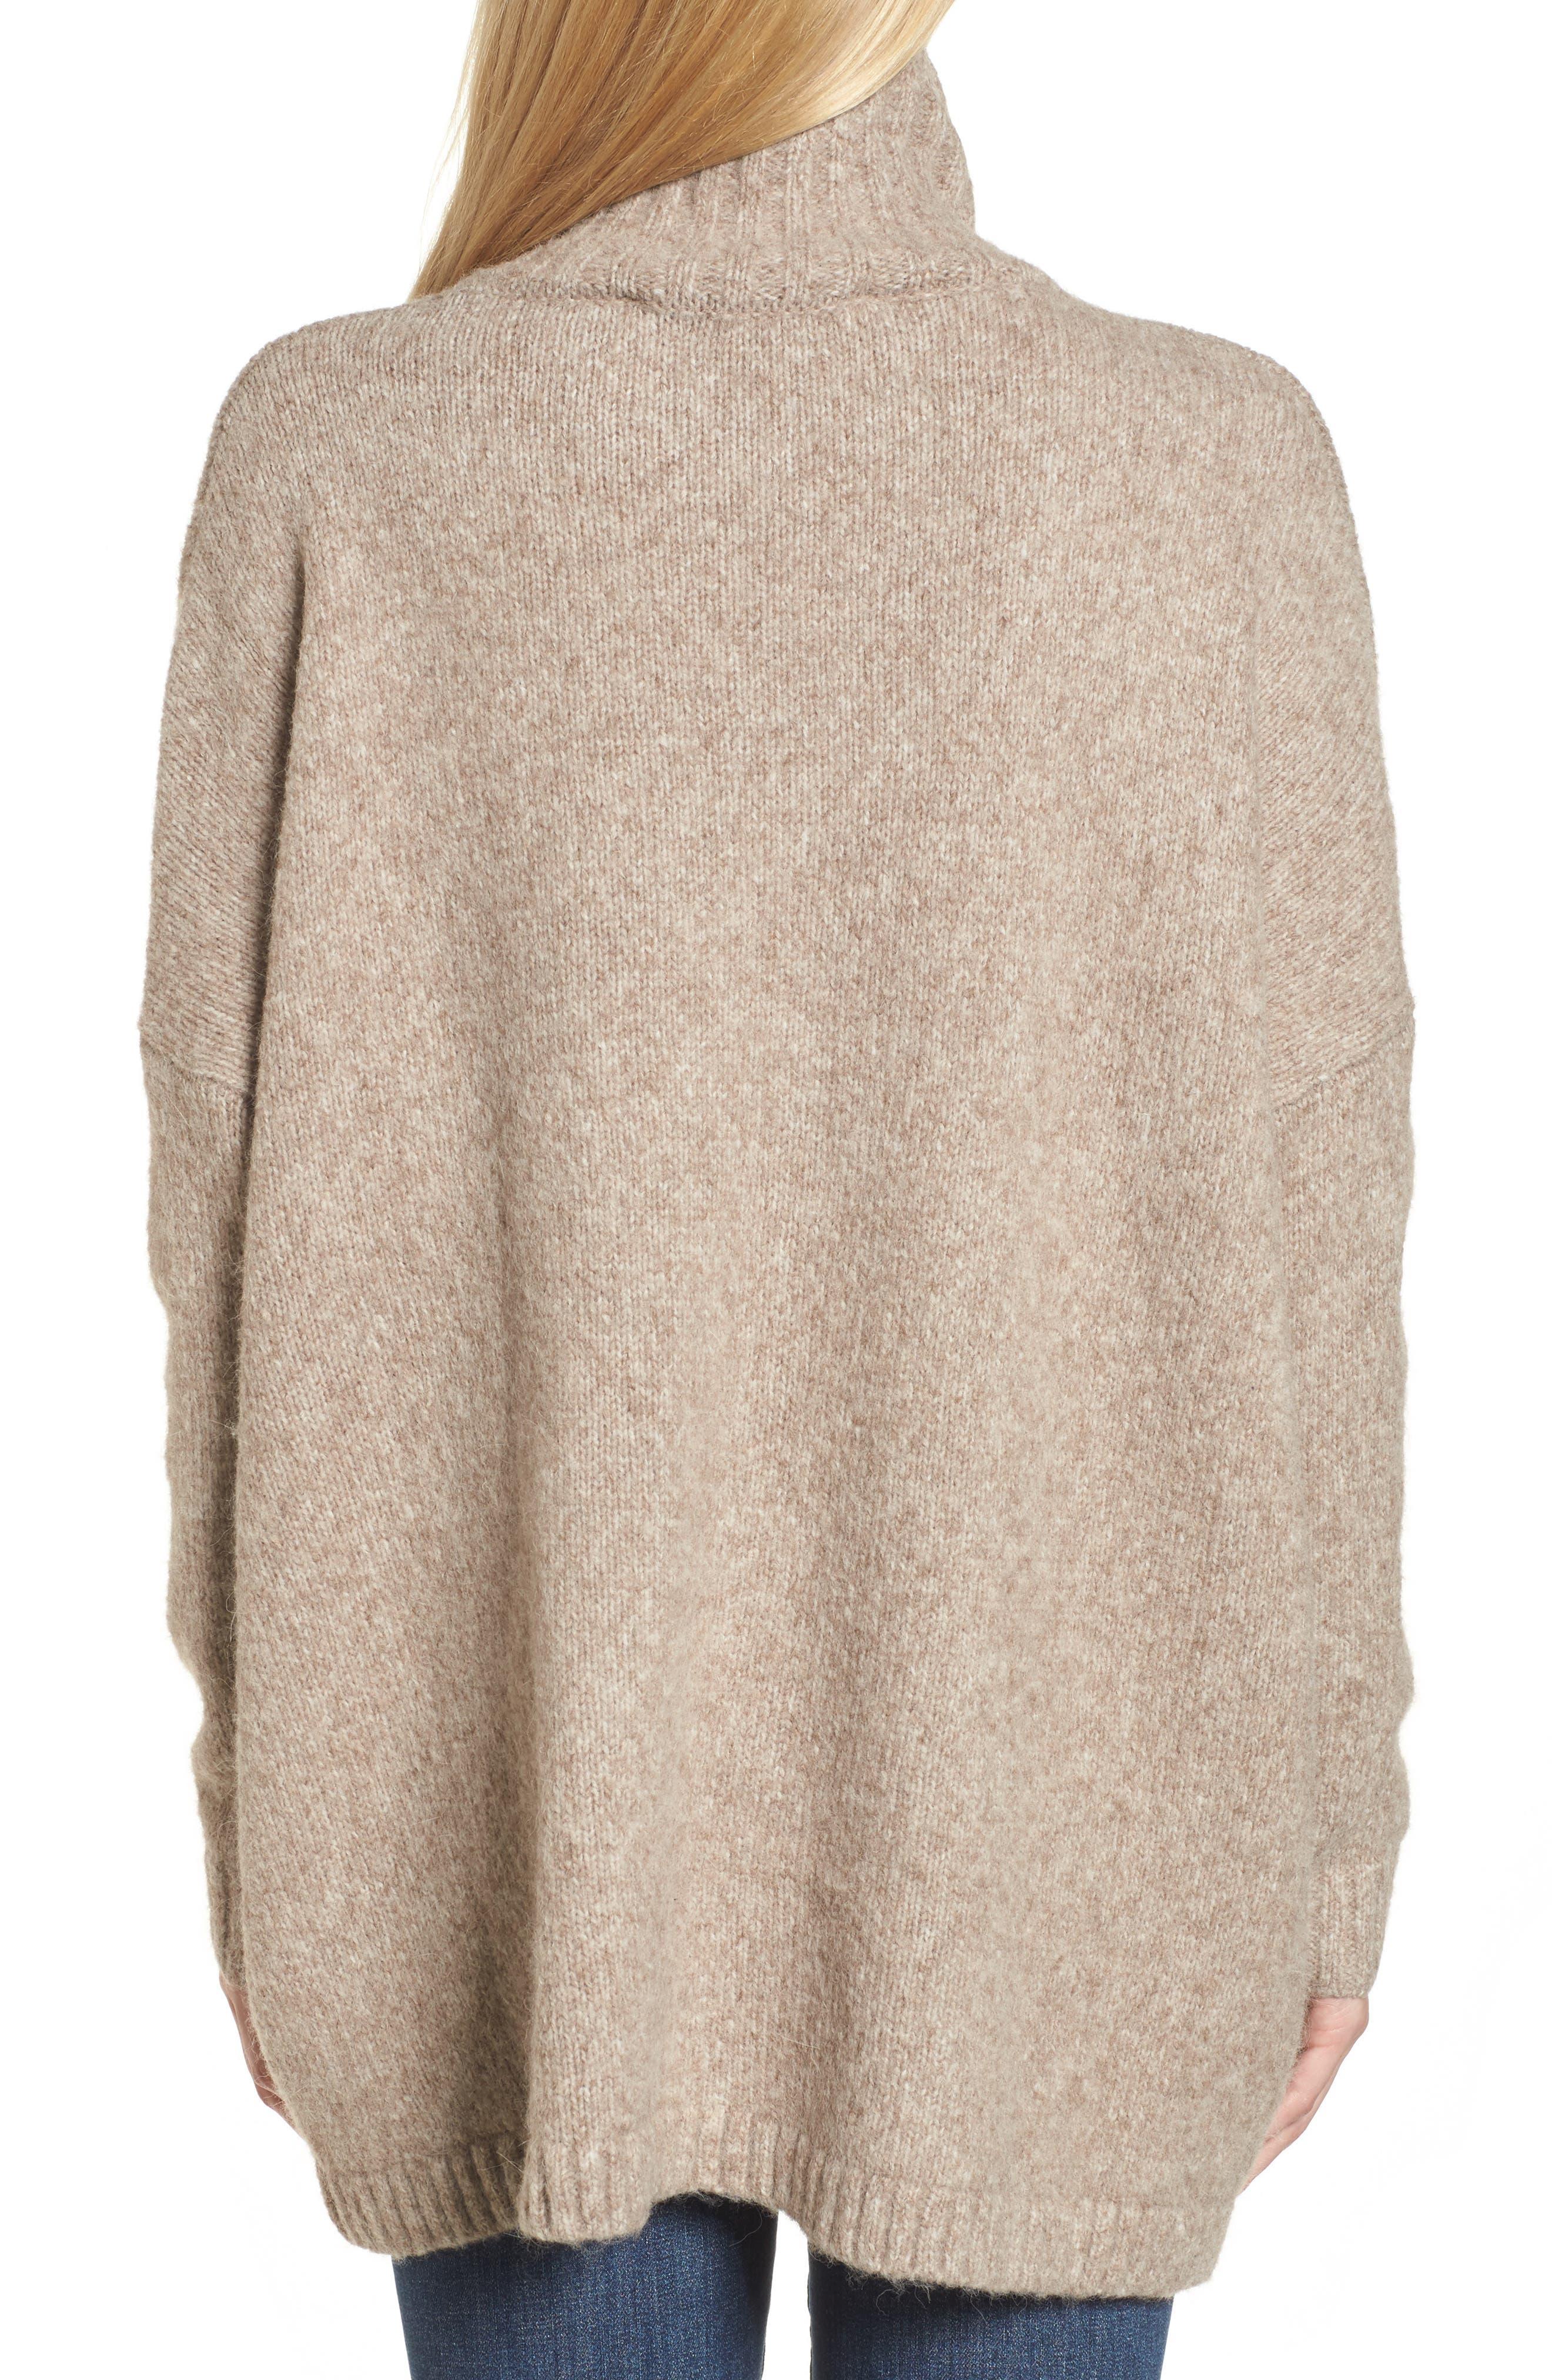 Ora Mock Neck Sweater,                             Alternate thumbnail 2, color,                             250